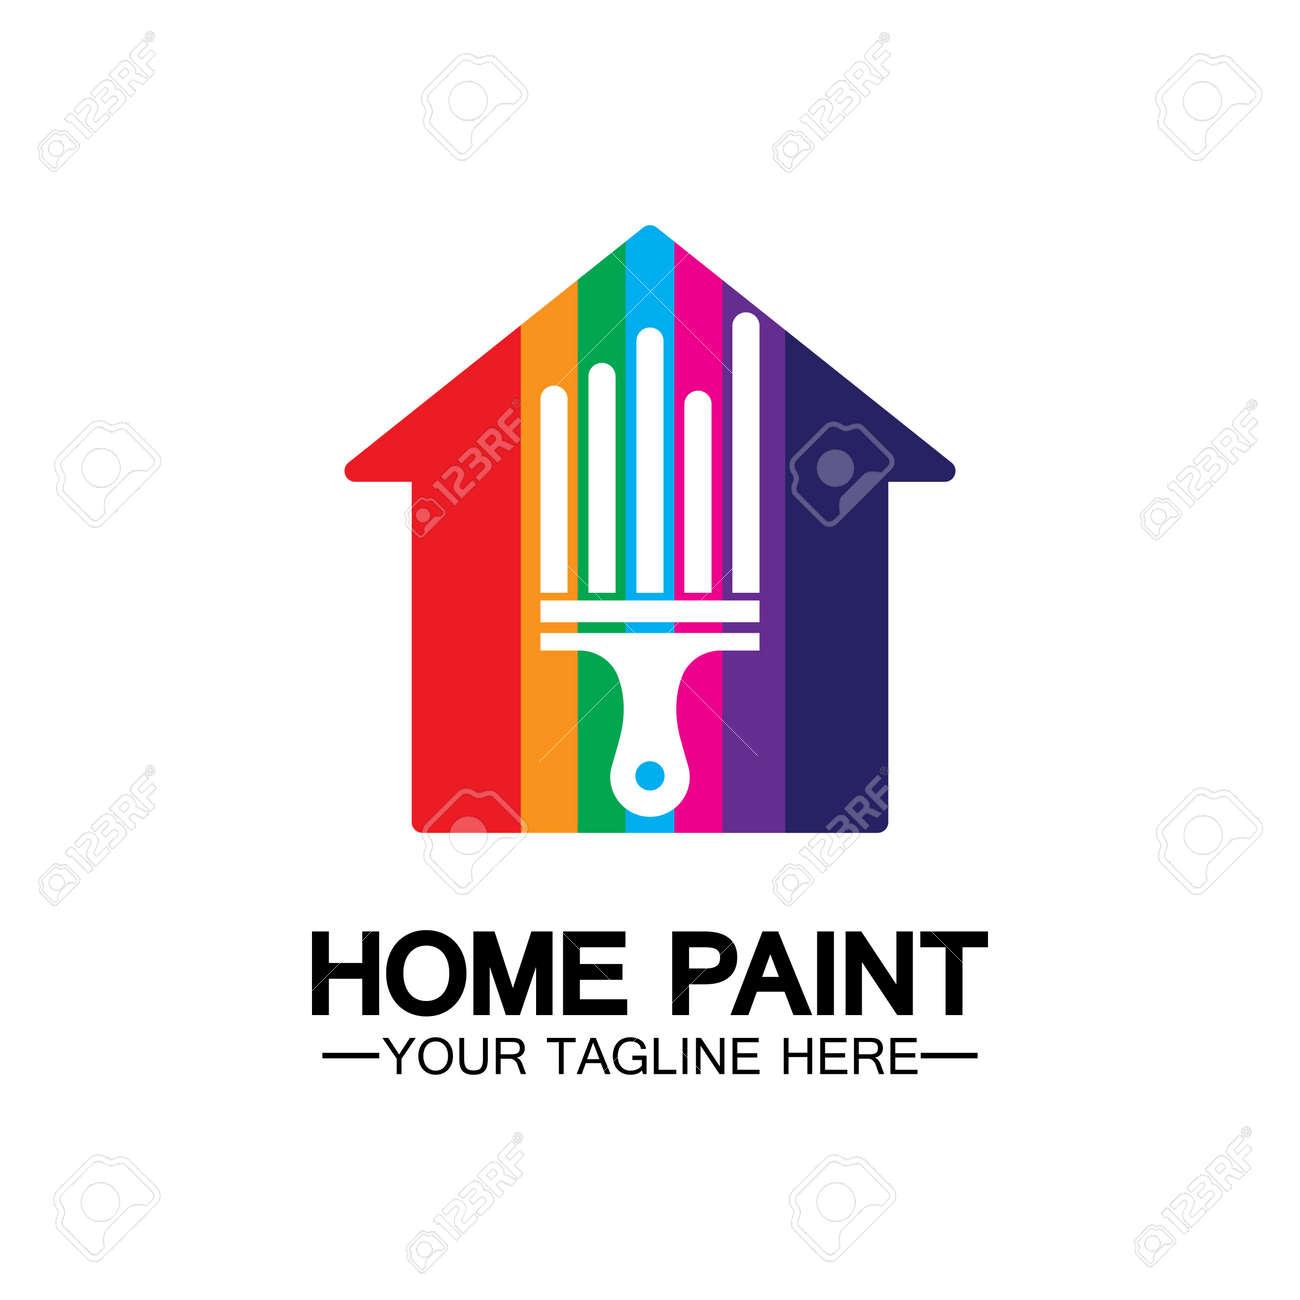 Home Painting Vector Logo Design.Home House Painting Service Coloring Logo Design Template.House painting service, decor and repair multicolor icon Vector logo. - 165929595